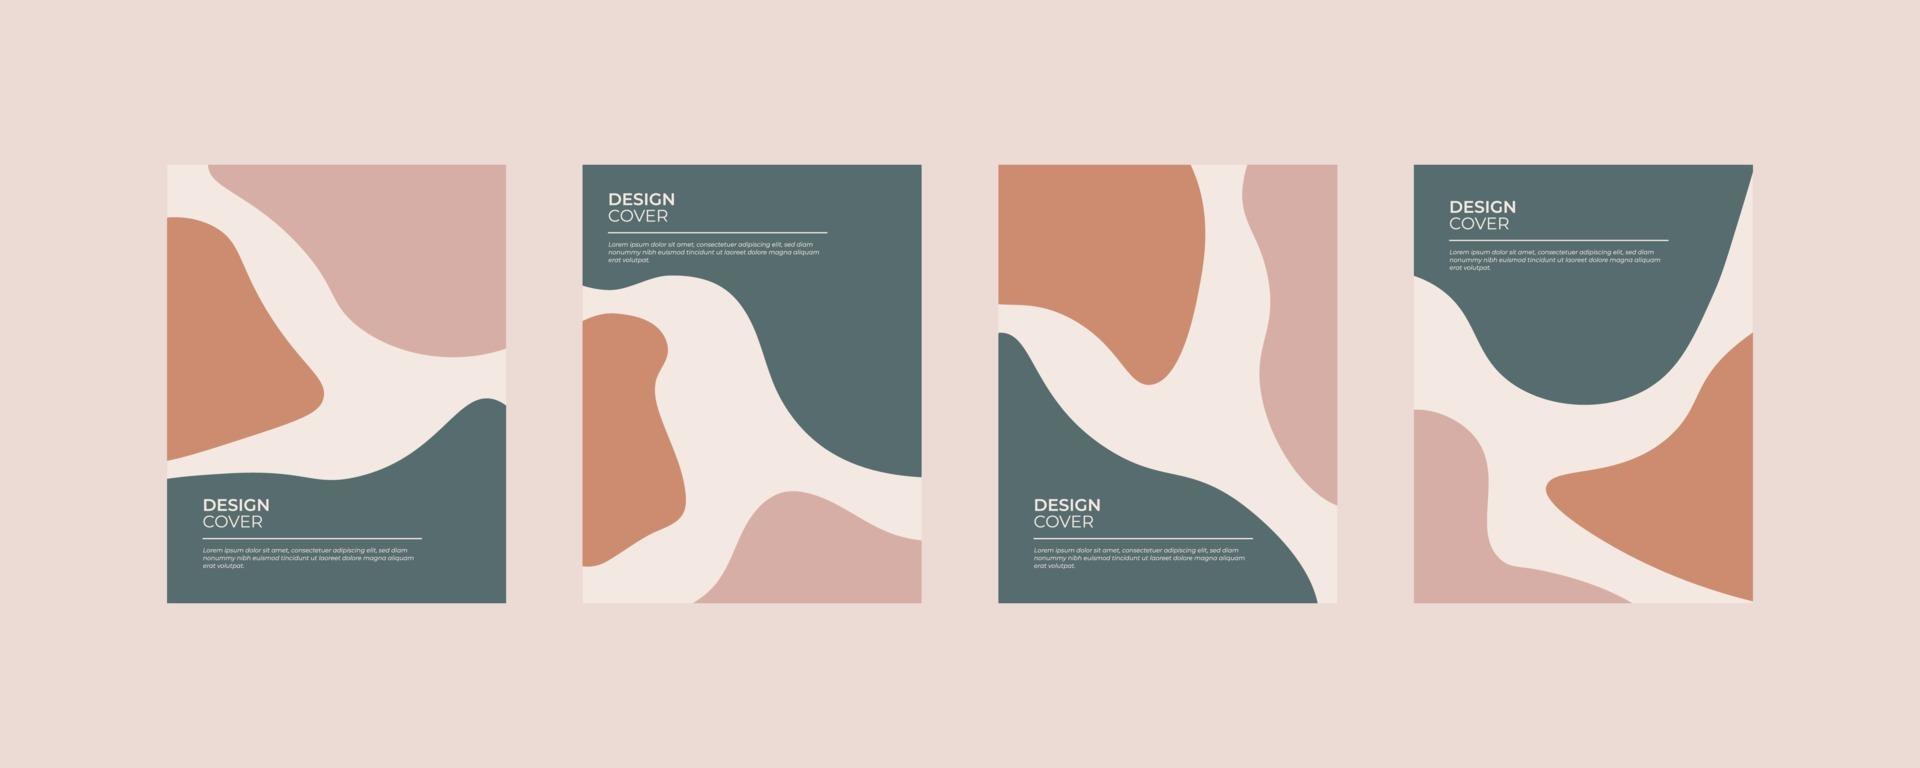 conjunto de modelos de design de capa universal criativa abstrata. vetor